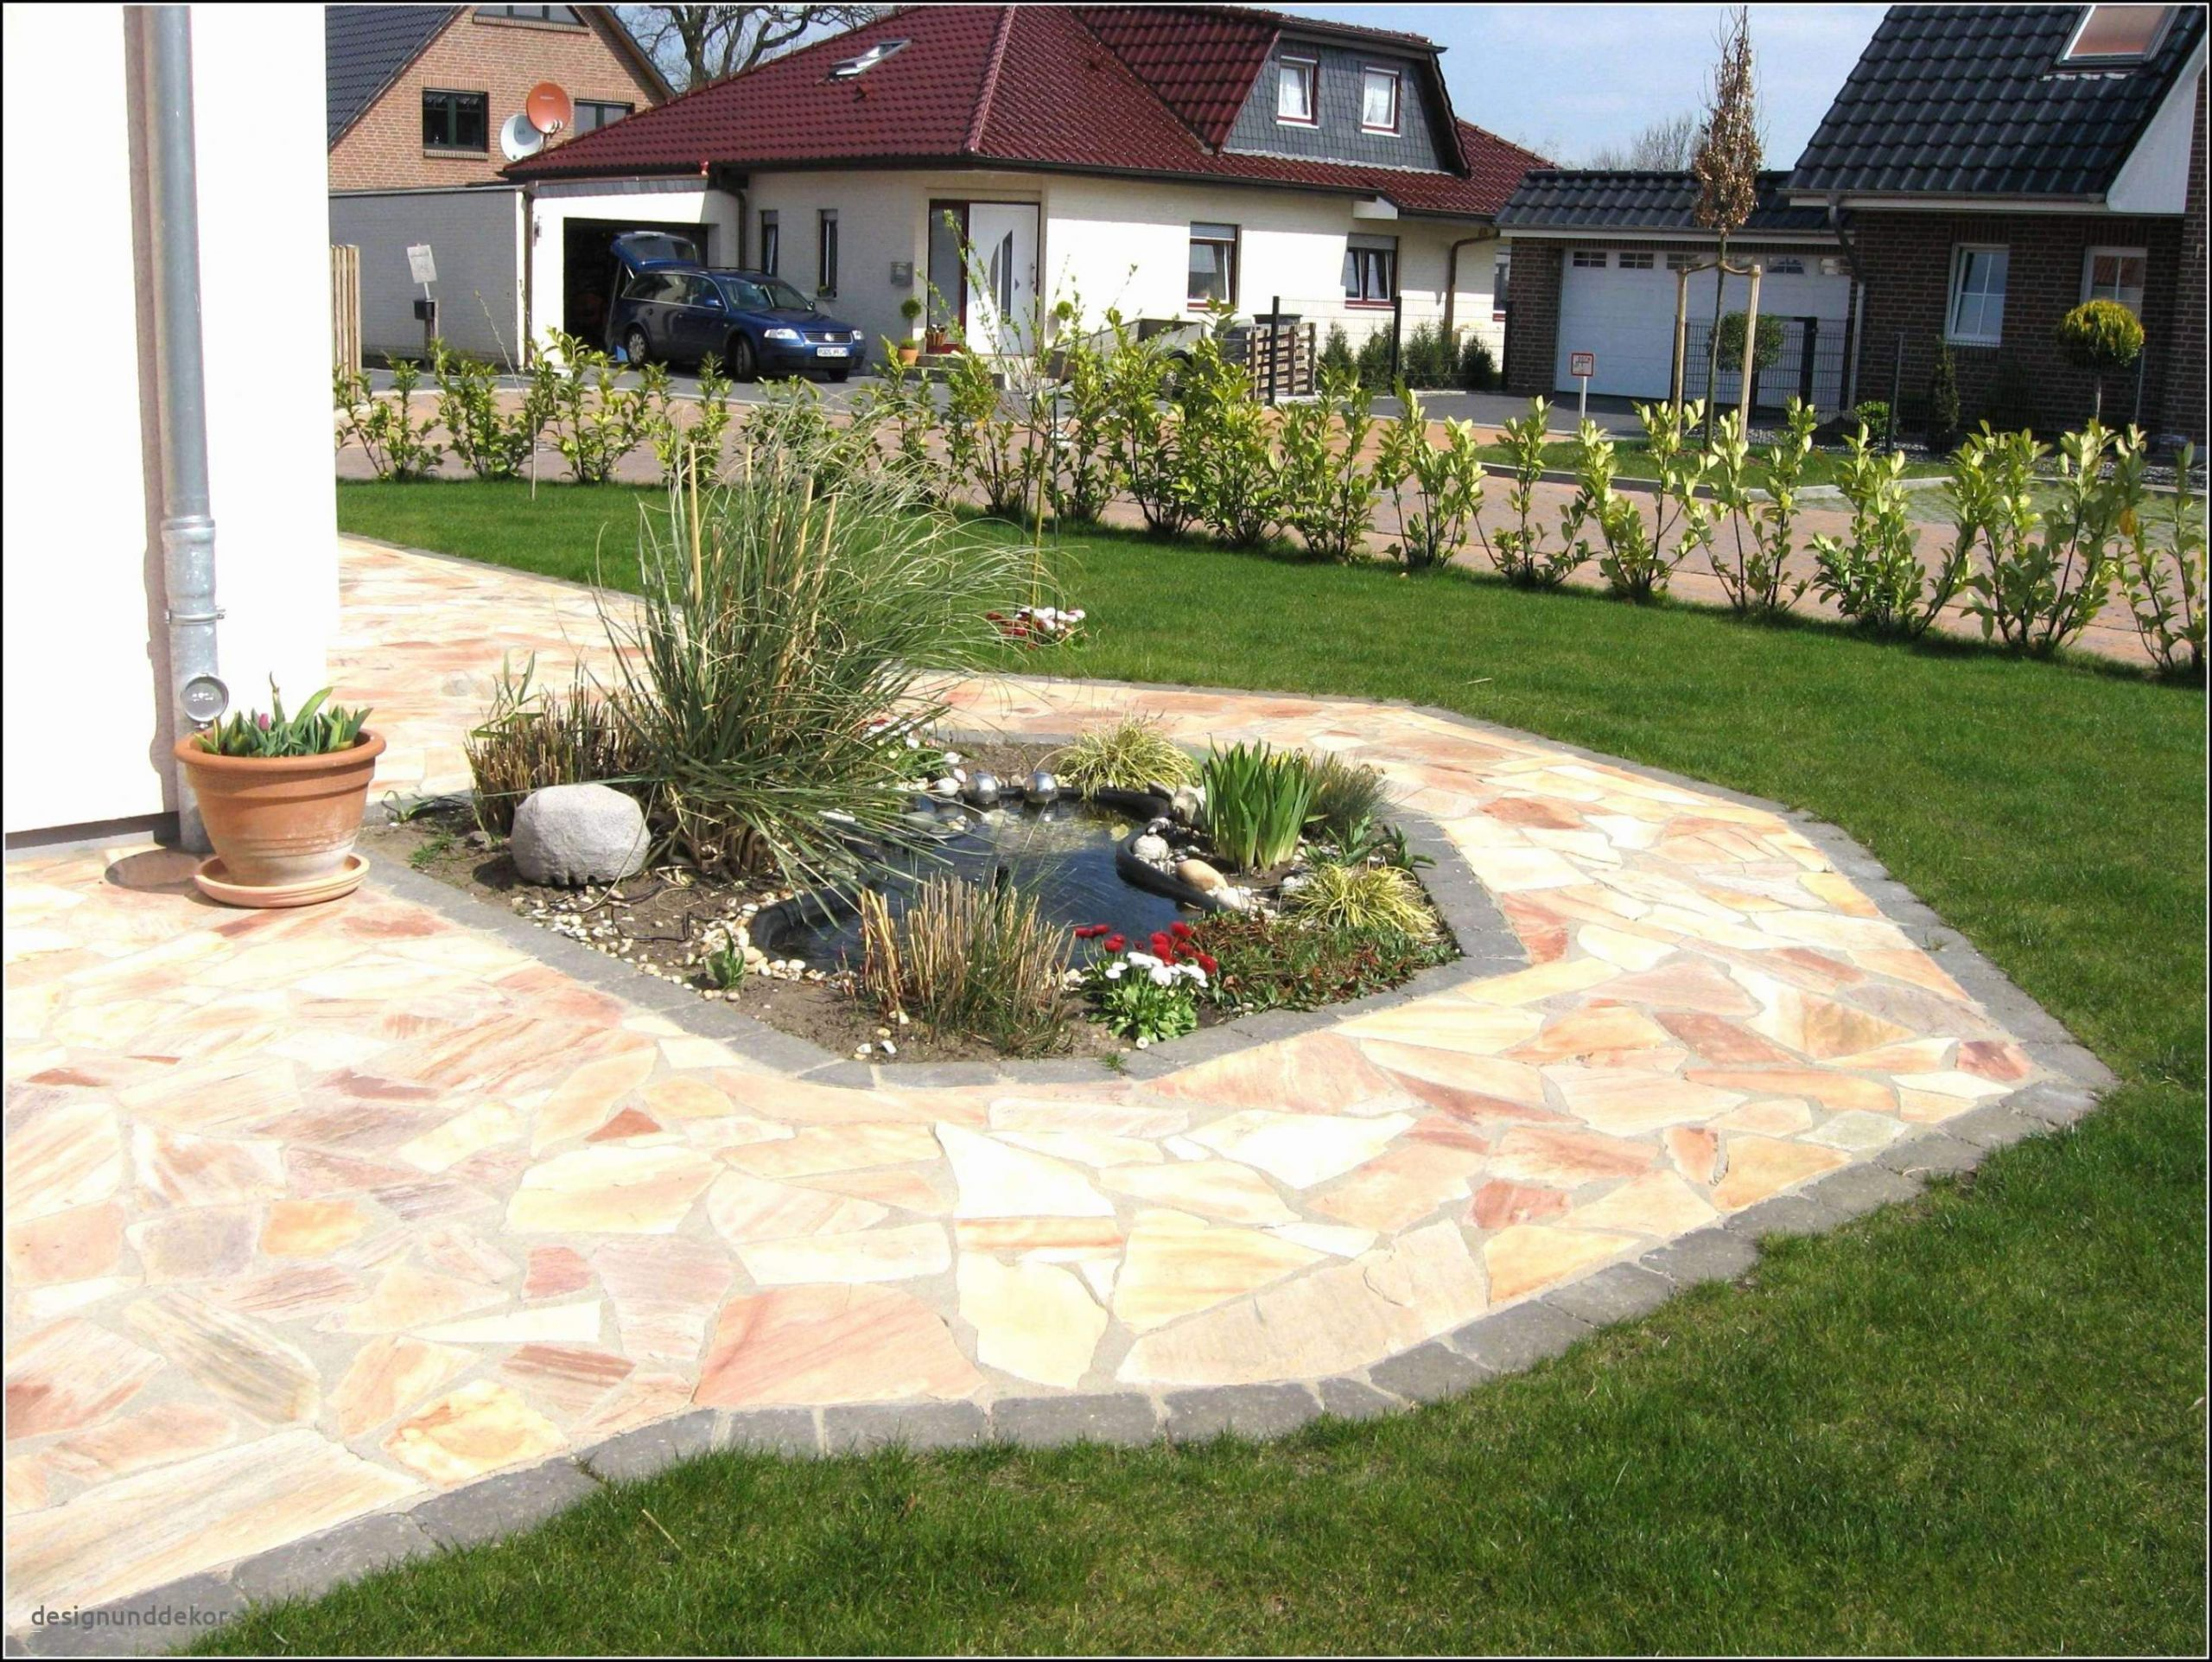 Garten Selbst Gestalten Luxus Hang Gestalten Pflegeleicht — Temobardz Home Blog